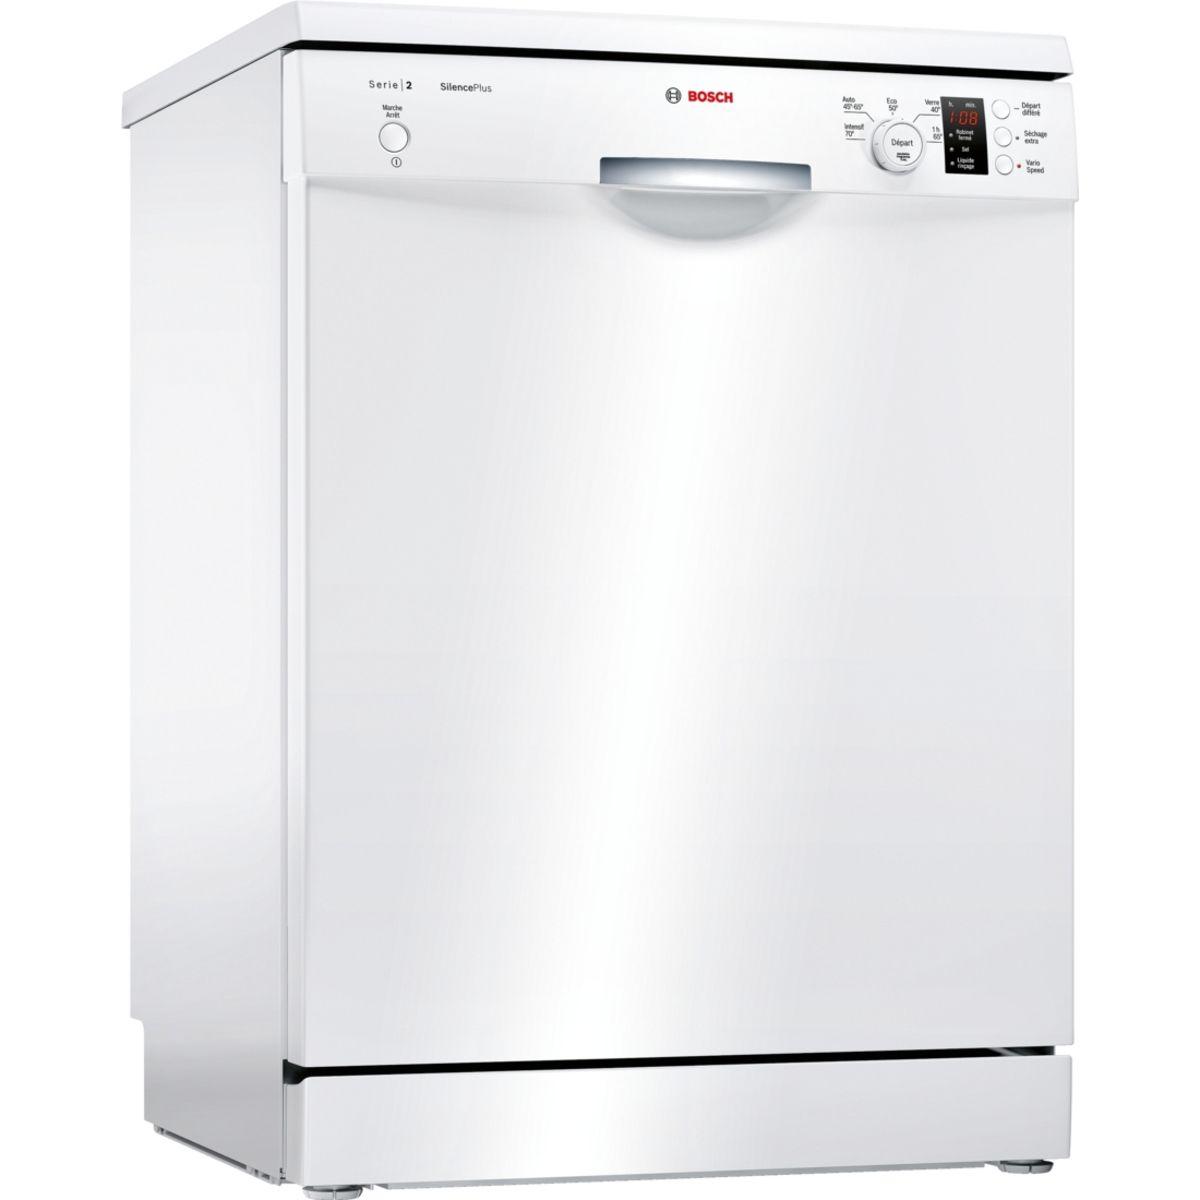 Lave-vaisselle pose libre SMS25AW00F - 12 couverts, 60cm, 48dB, 5 programmes